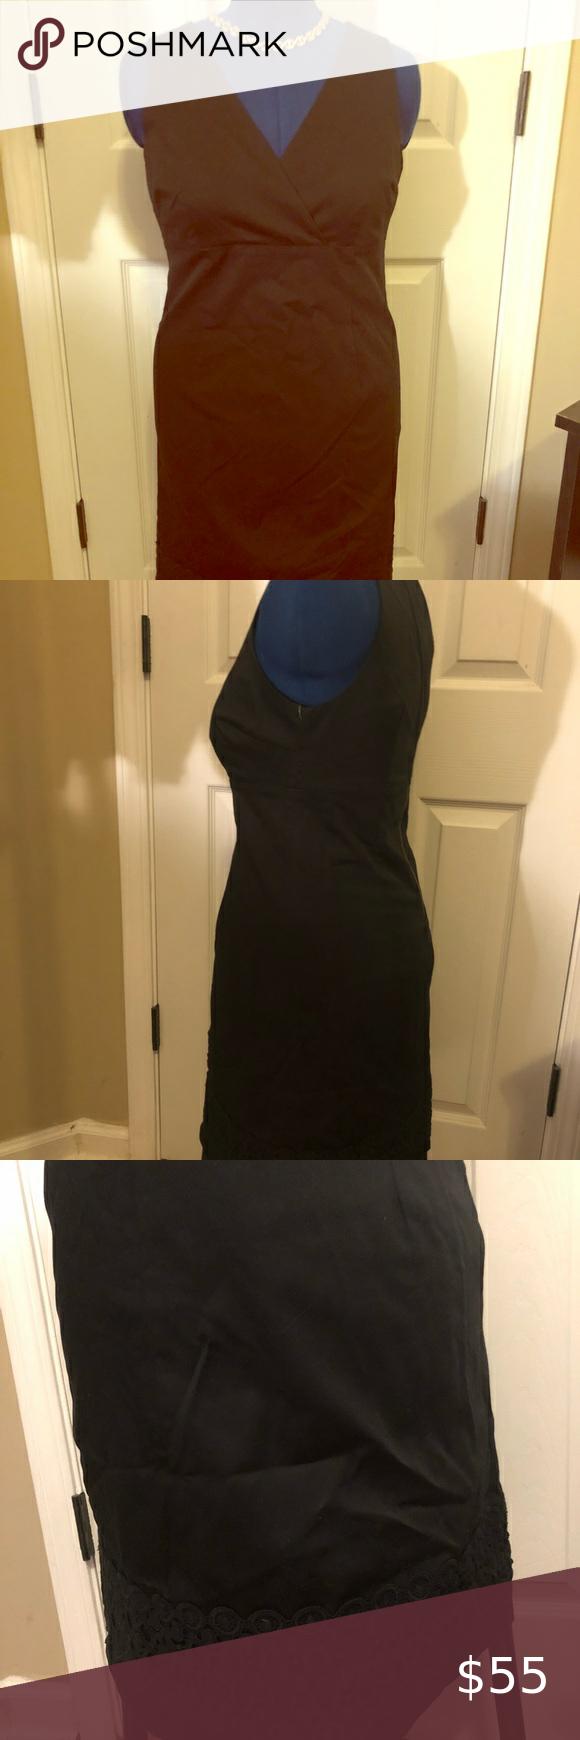 Michael Kors Black Dress Size 12 Black Dress Michael Kors Black Dresses [ 1740 x 580 Pixel ]